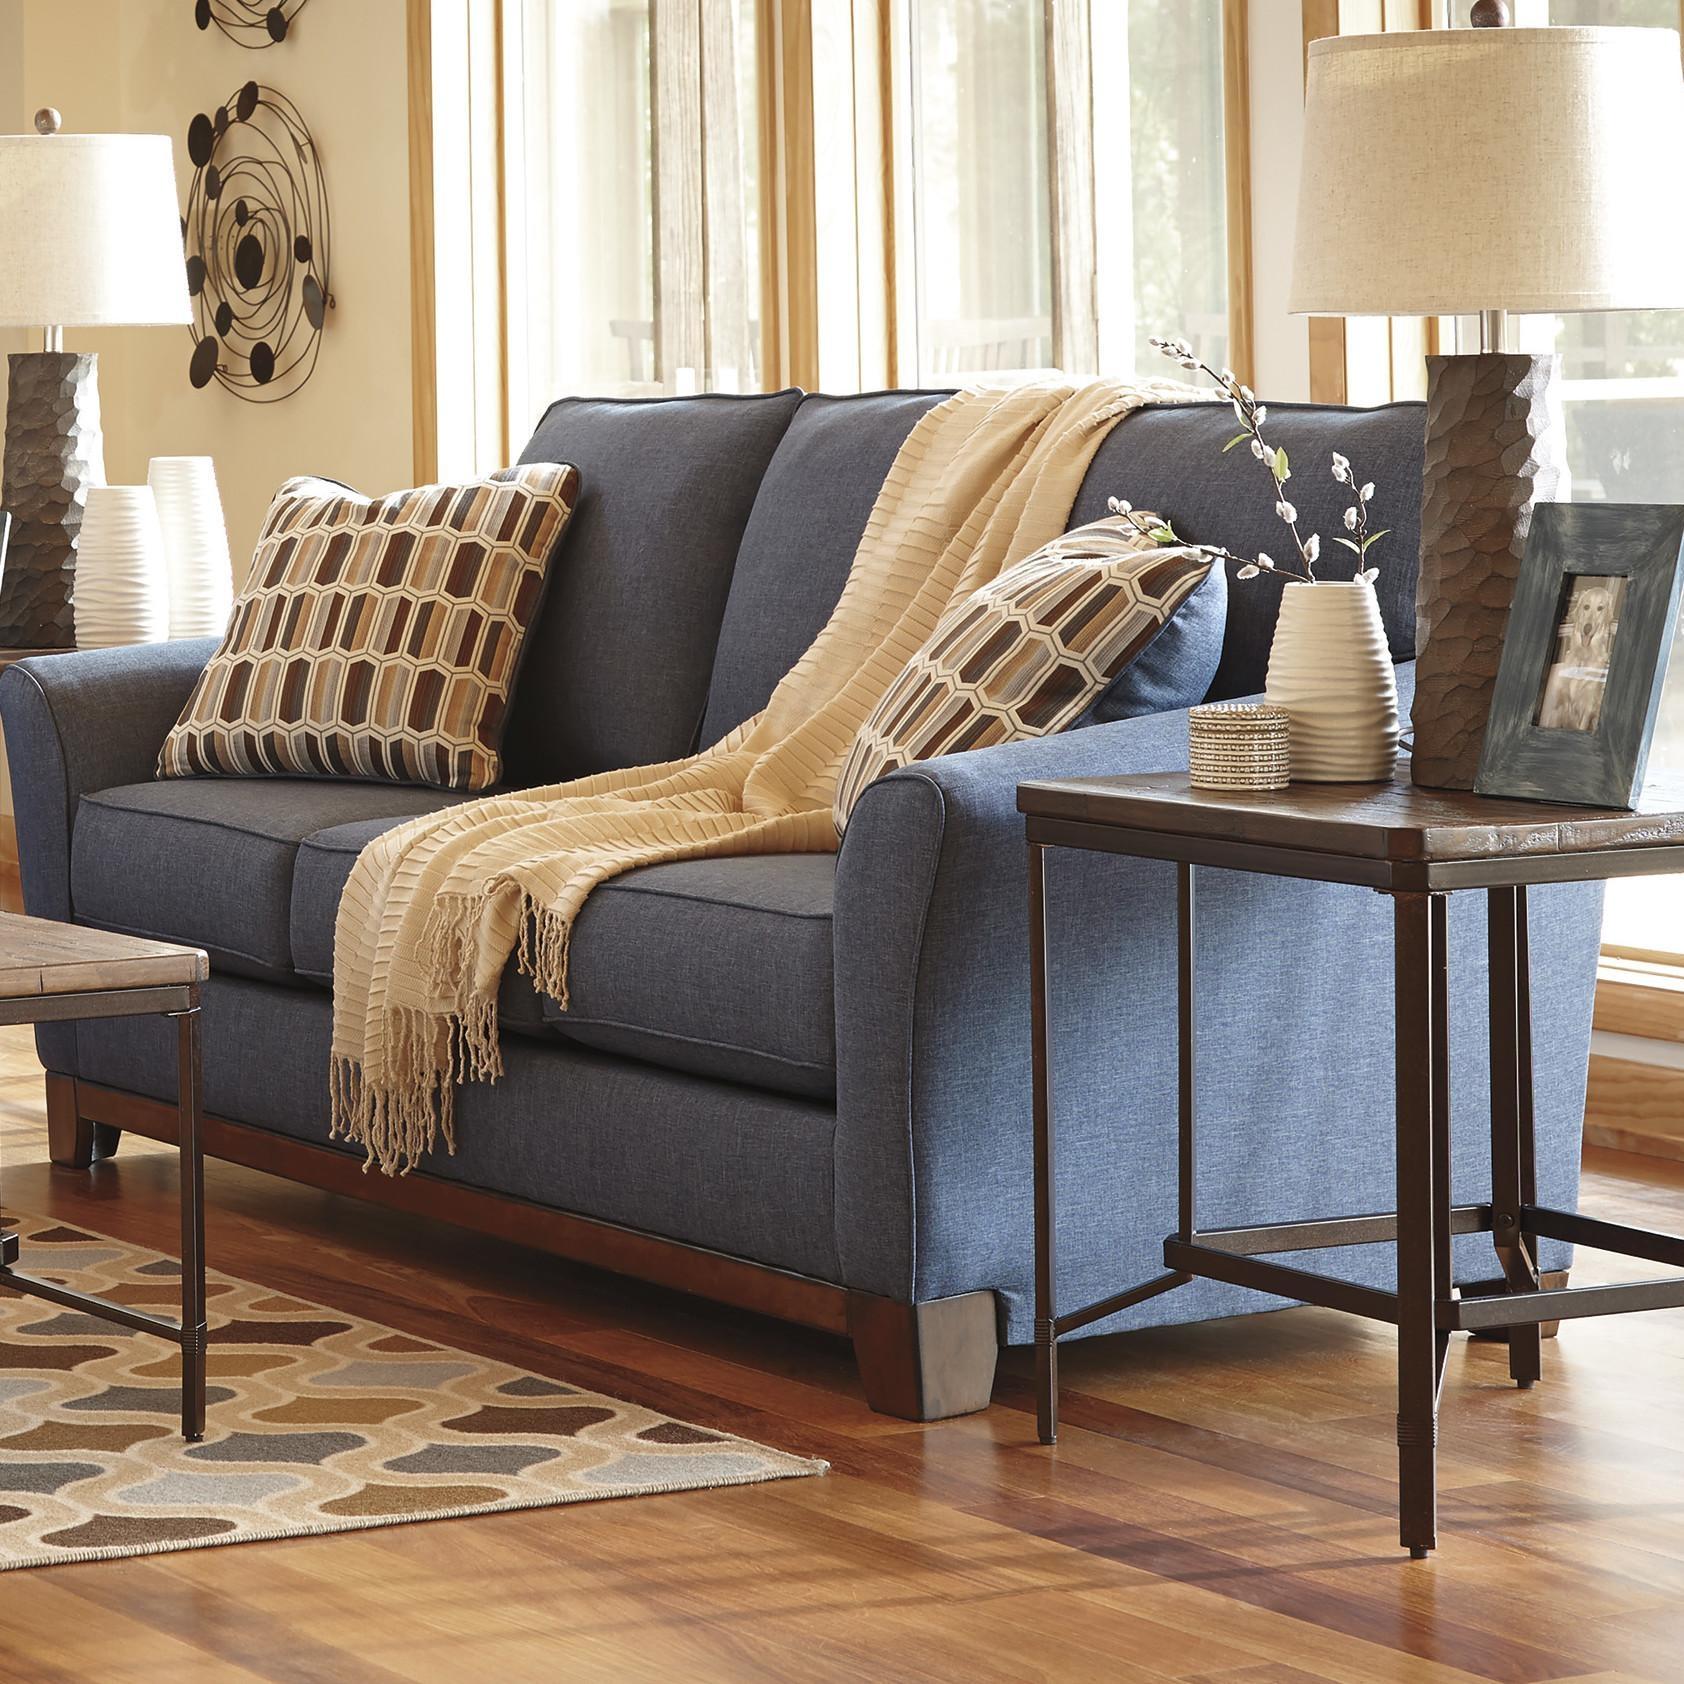 Furniture: Cindy Crawford Furniture | Cindy Crawford Sectional Pertaining To Cindy Crawford Sectional Sofas (View 20 of 20)